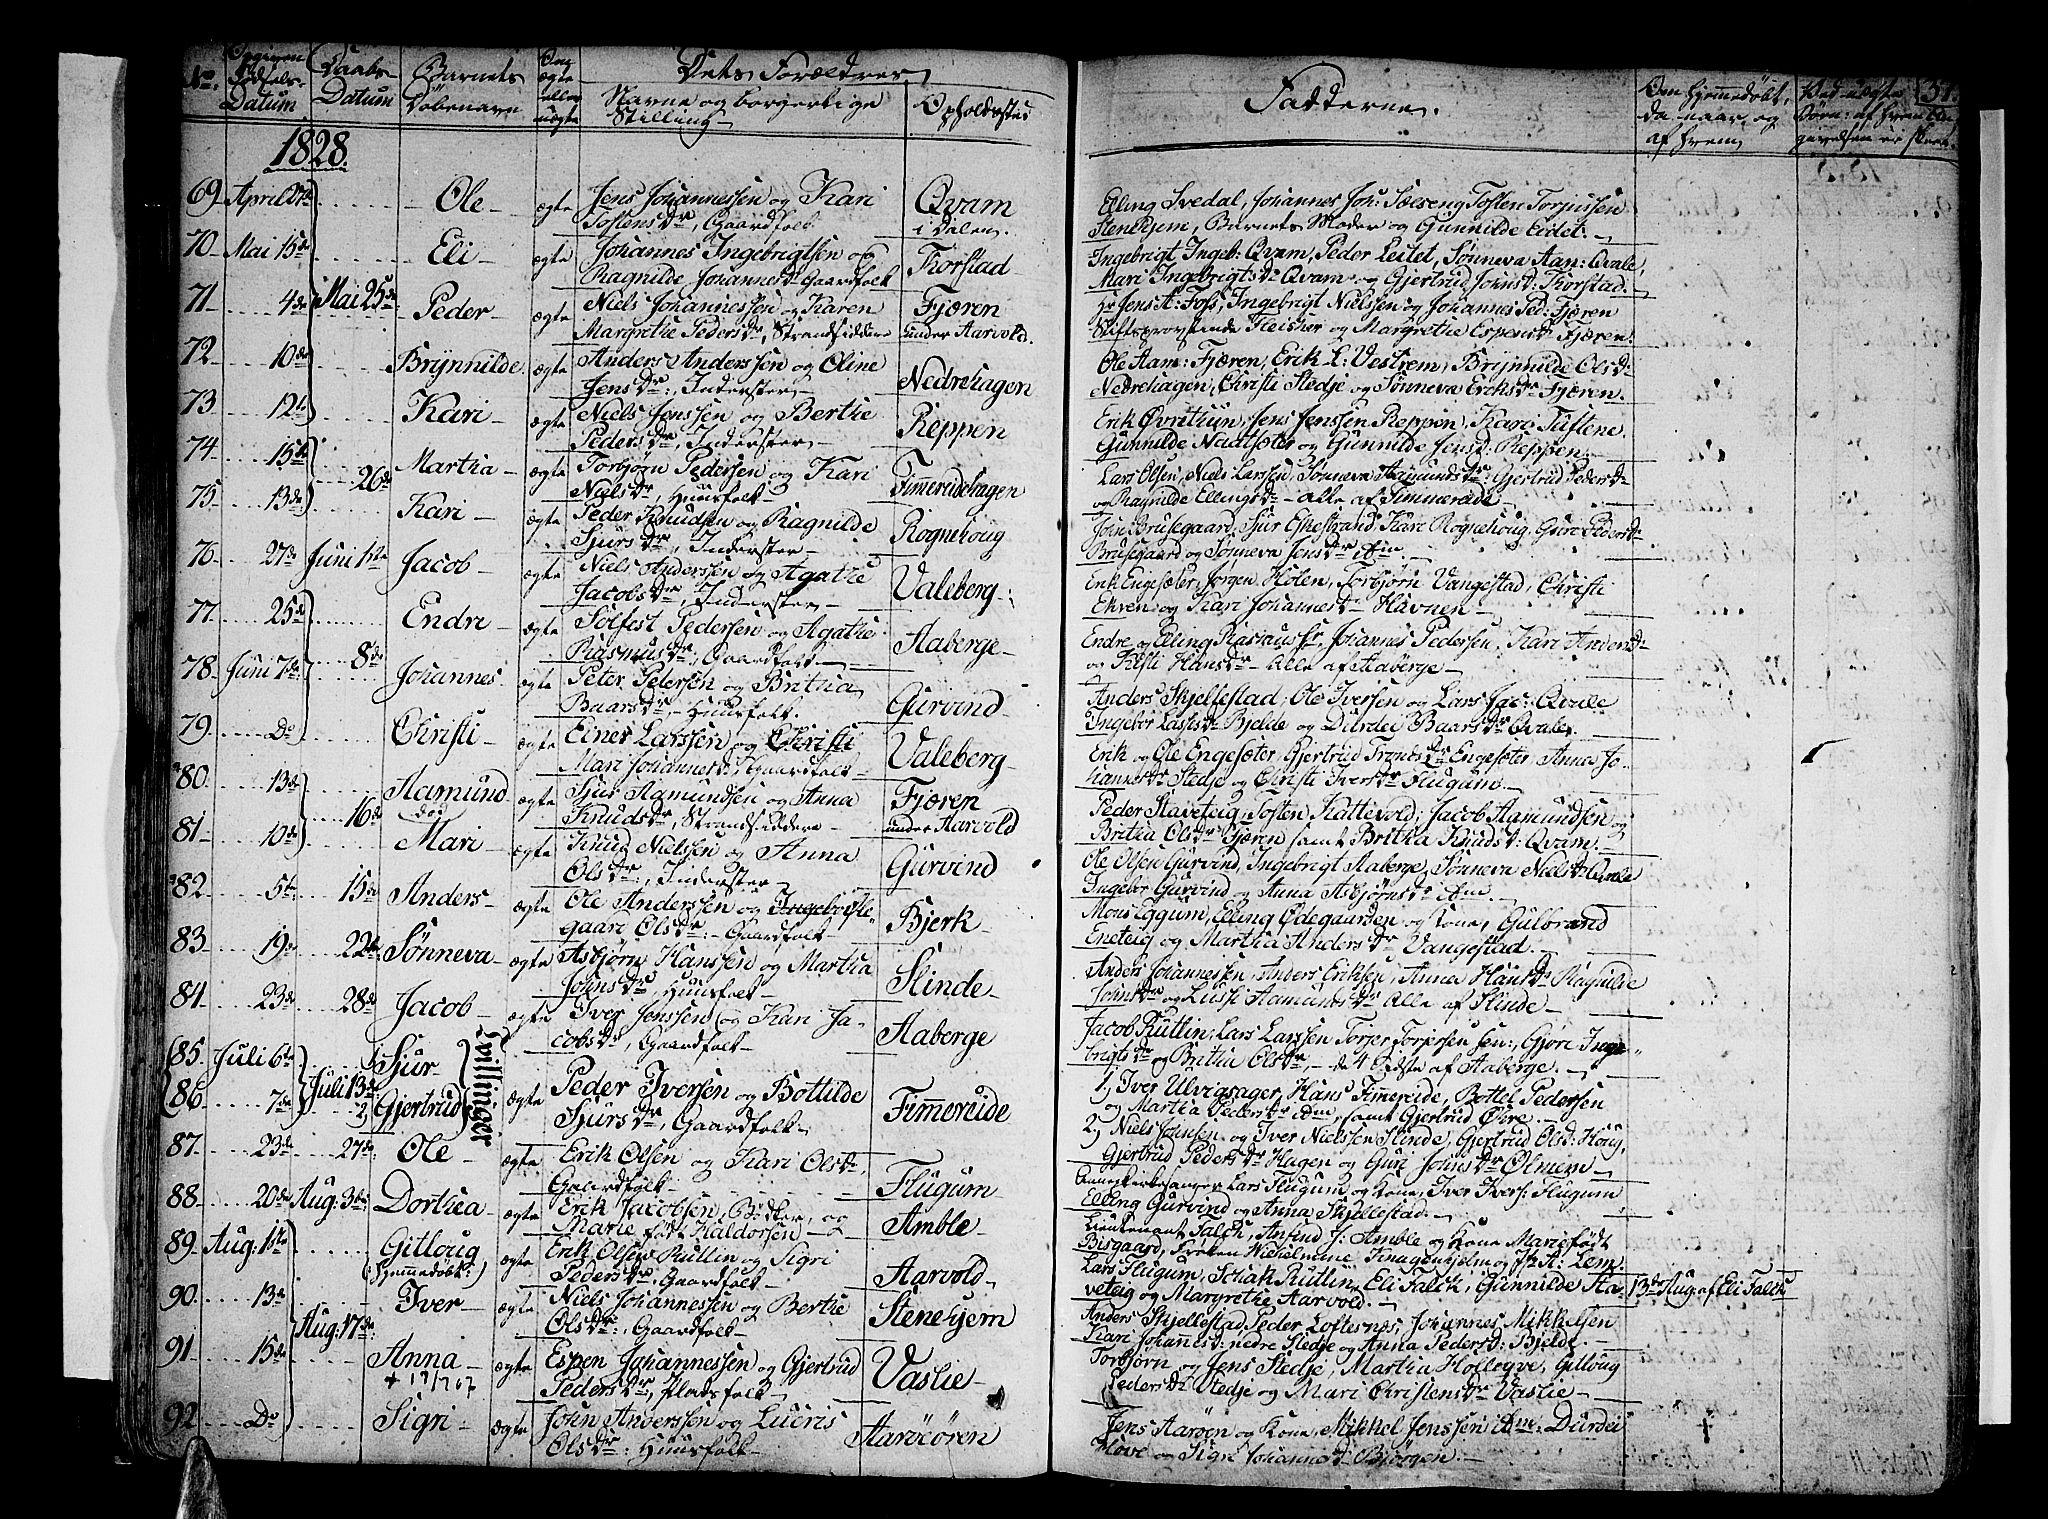 SAB, Sogndal sokneprestembete, H/Haa/Haaa/L0010: Ministerialbok nr. A 10, 1821-1838, s. 37